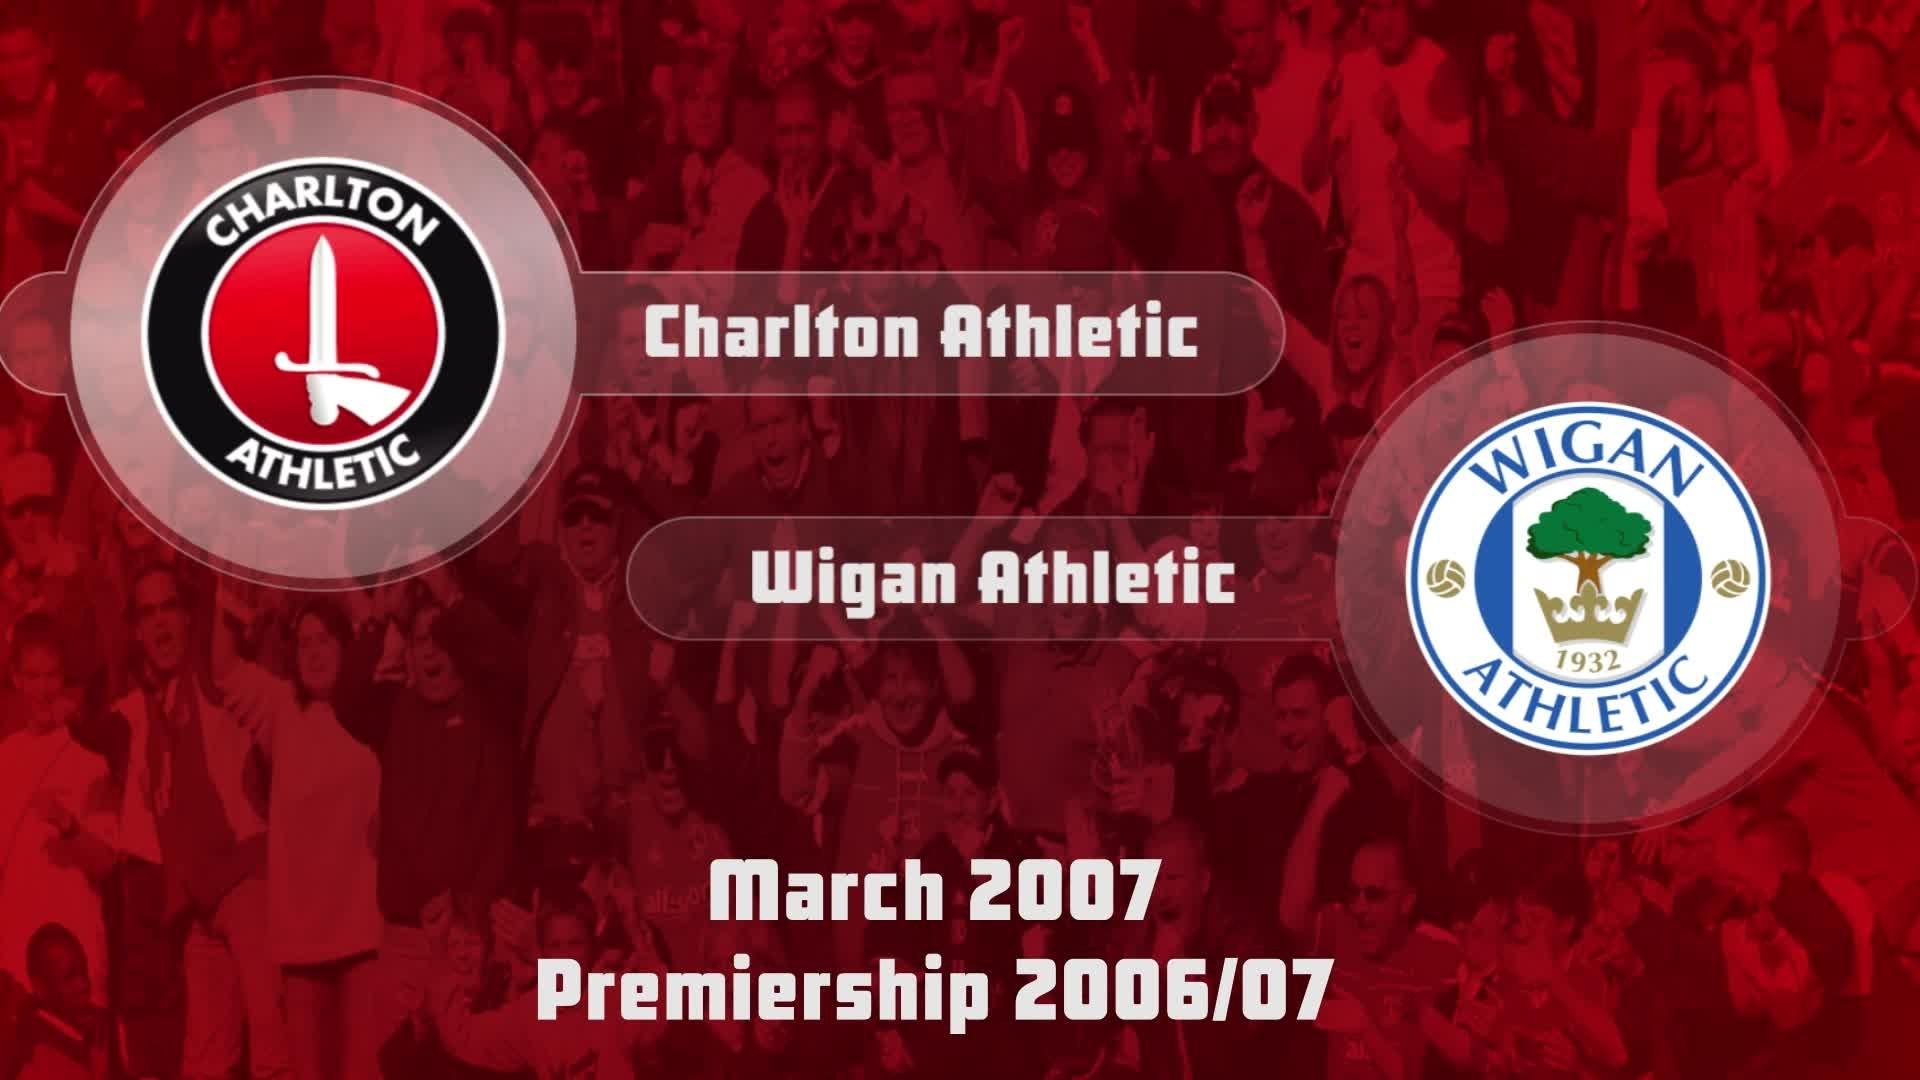 36 HIGHLIGHTS | Charlton 1 Wigan 0 (March 2007)